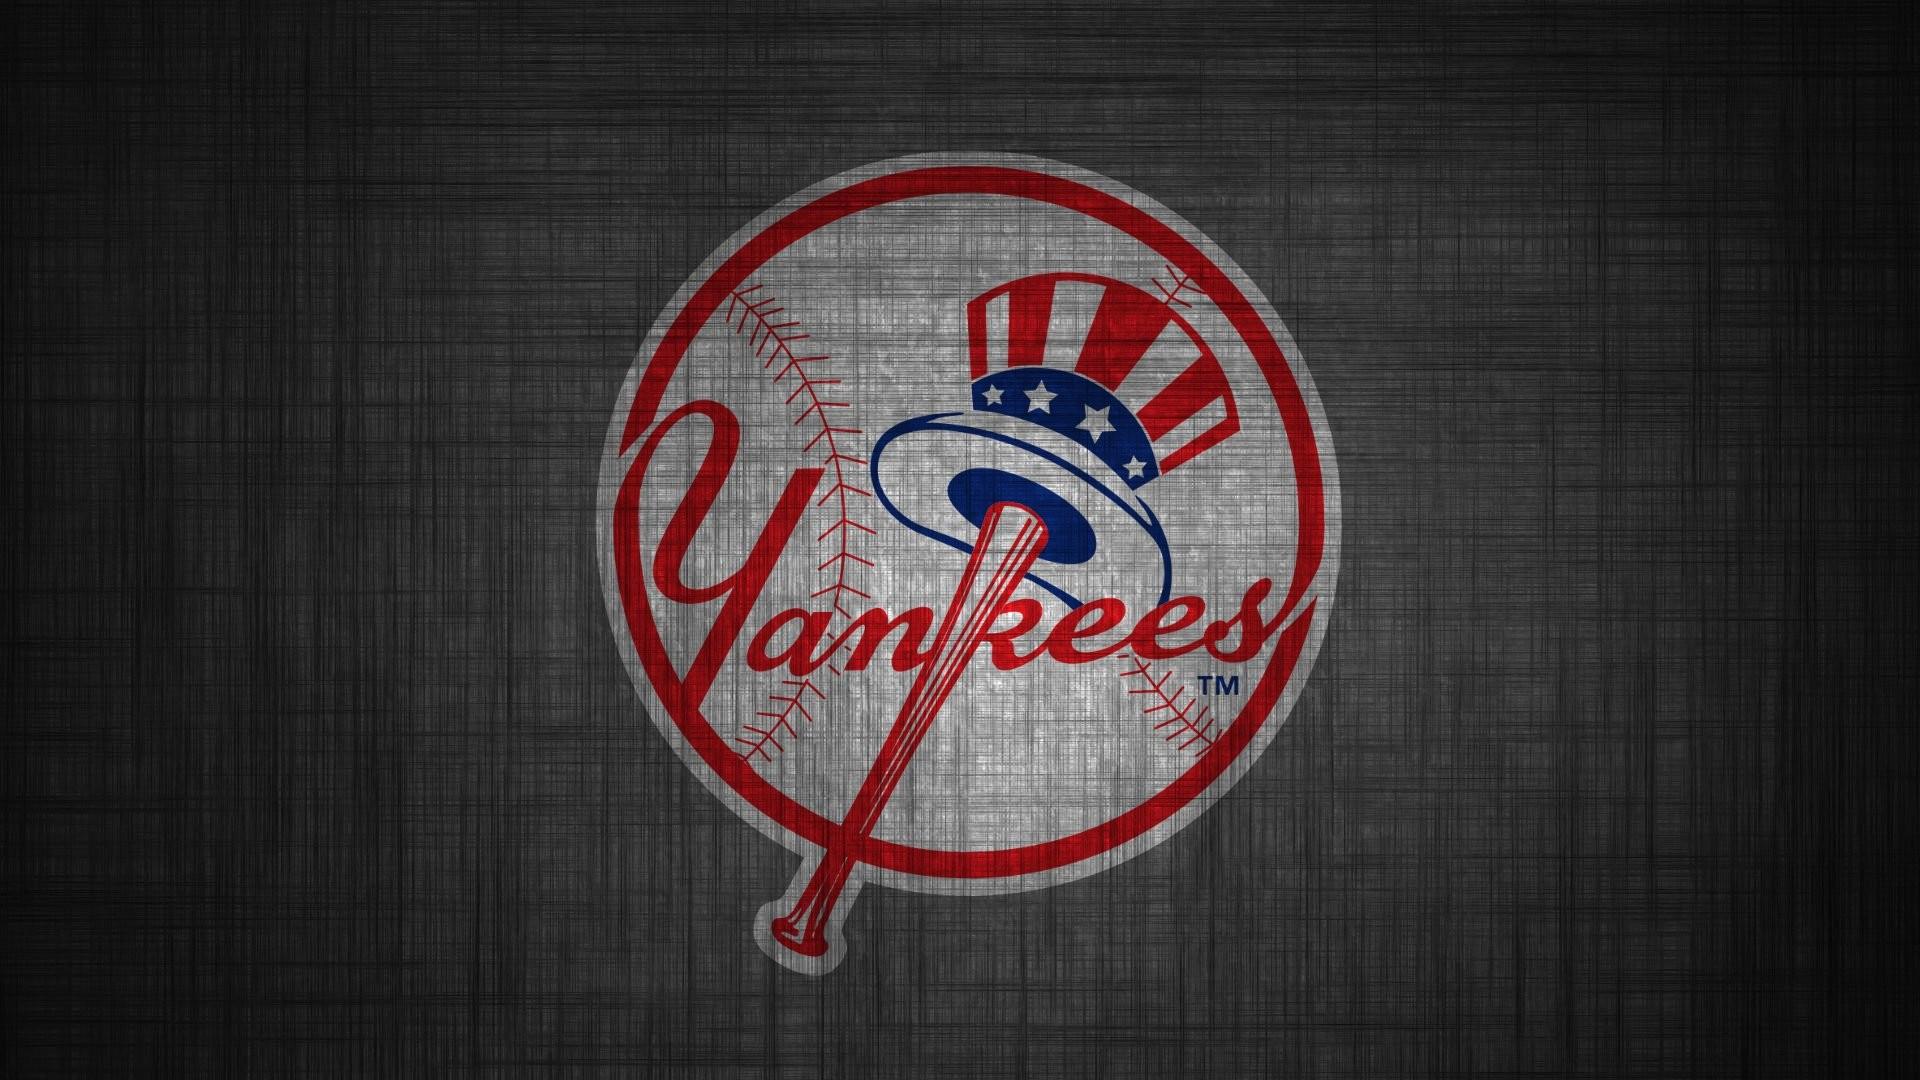 0 New York Yankees Wallpapers Group New York Yankees Wallpapers HD Pixels  Talk